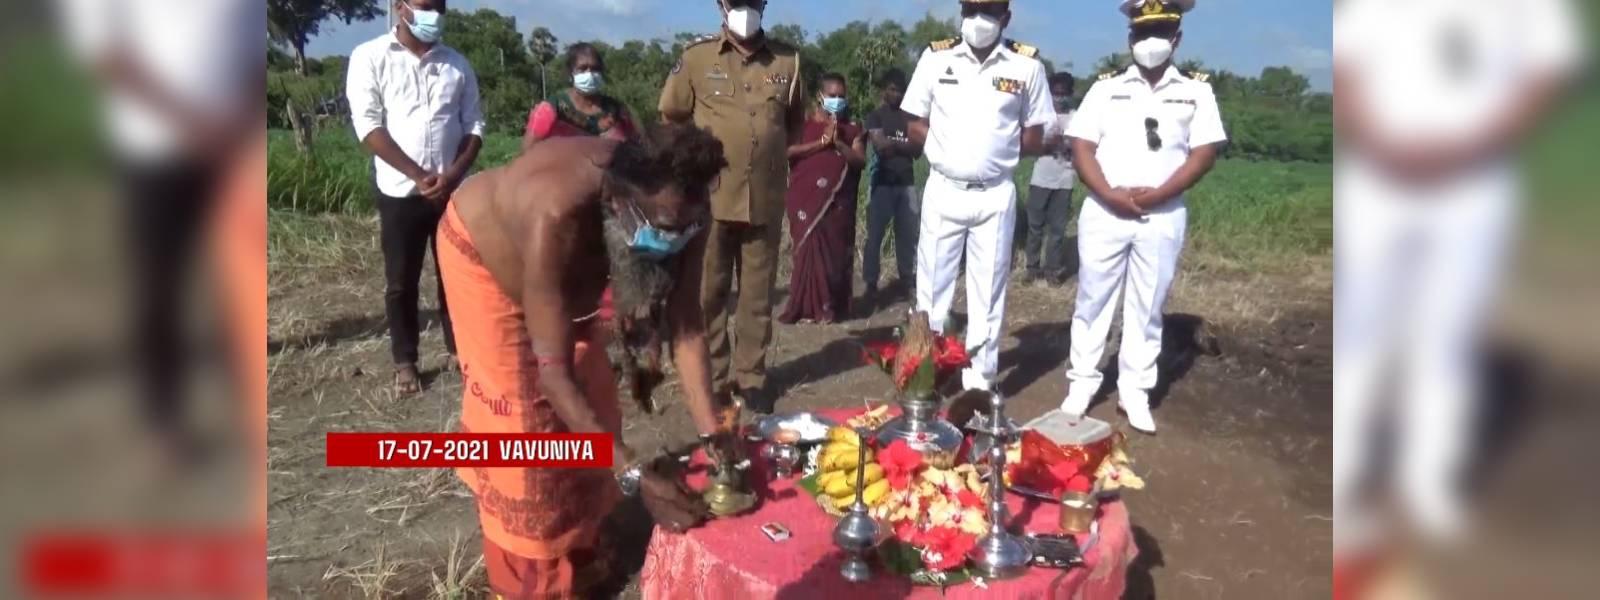 Gammadda steps in to address longstanding need of villagers in Vavuniya